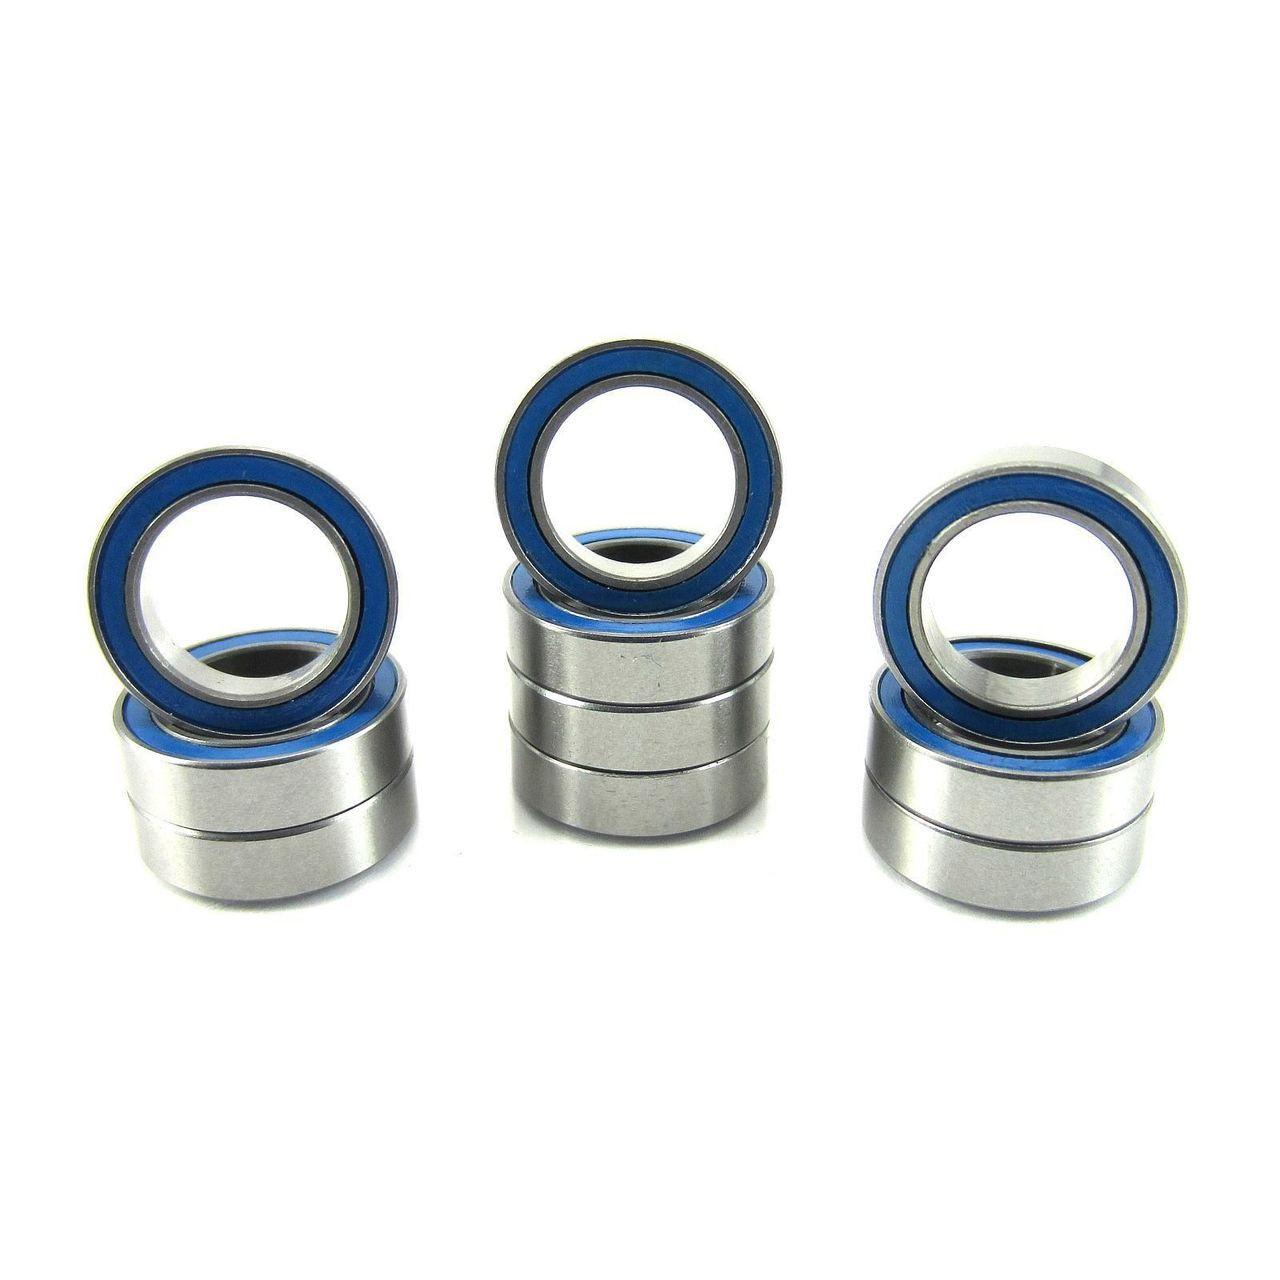 TRB RC 10x15x4mm Precision Ball Bearings ABEC 3 Rubber Sealed BLU (10)